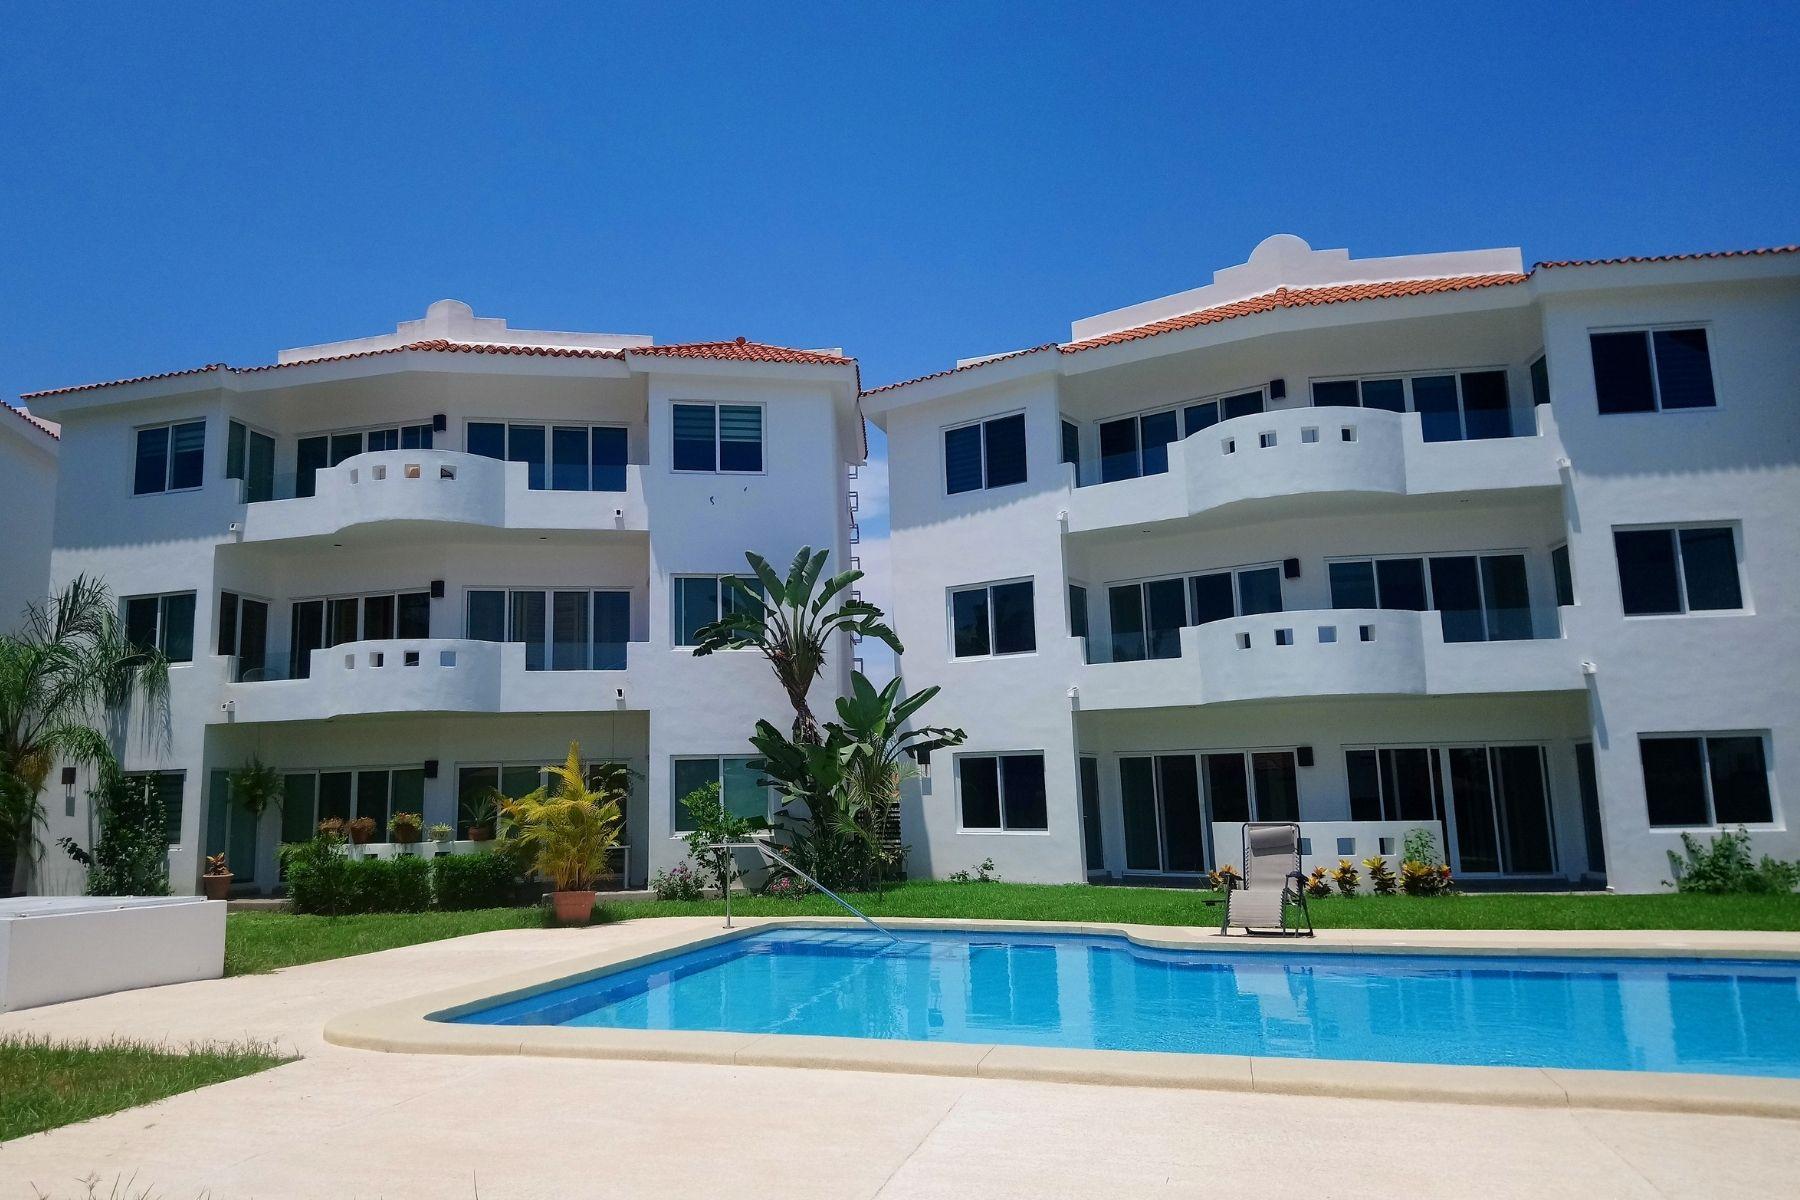 Alberca 2 condominios Marbella.jpg